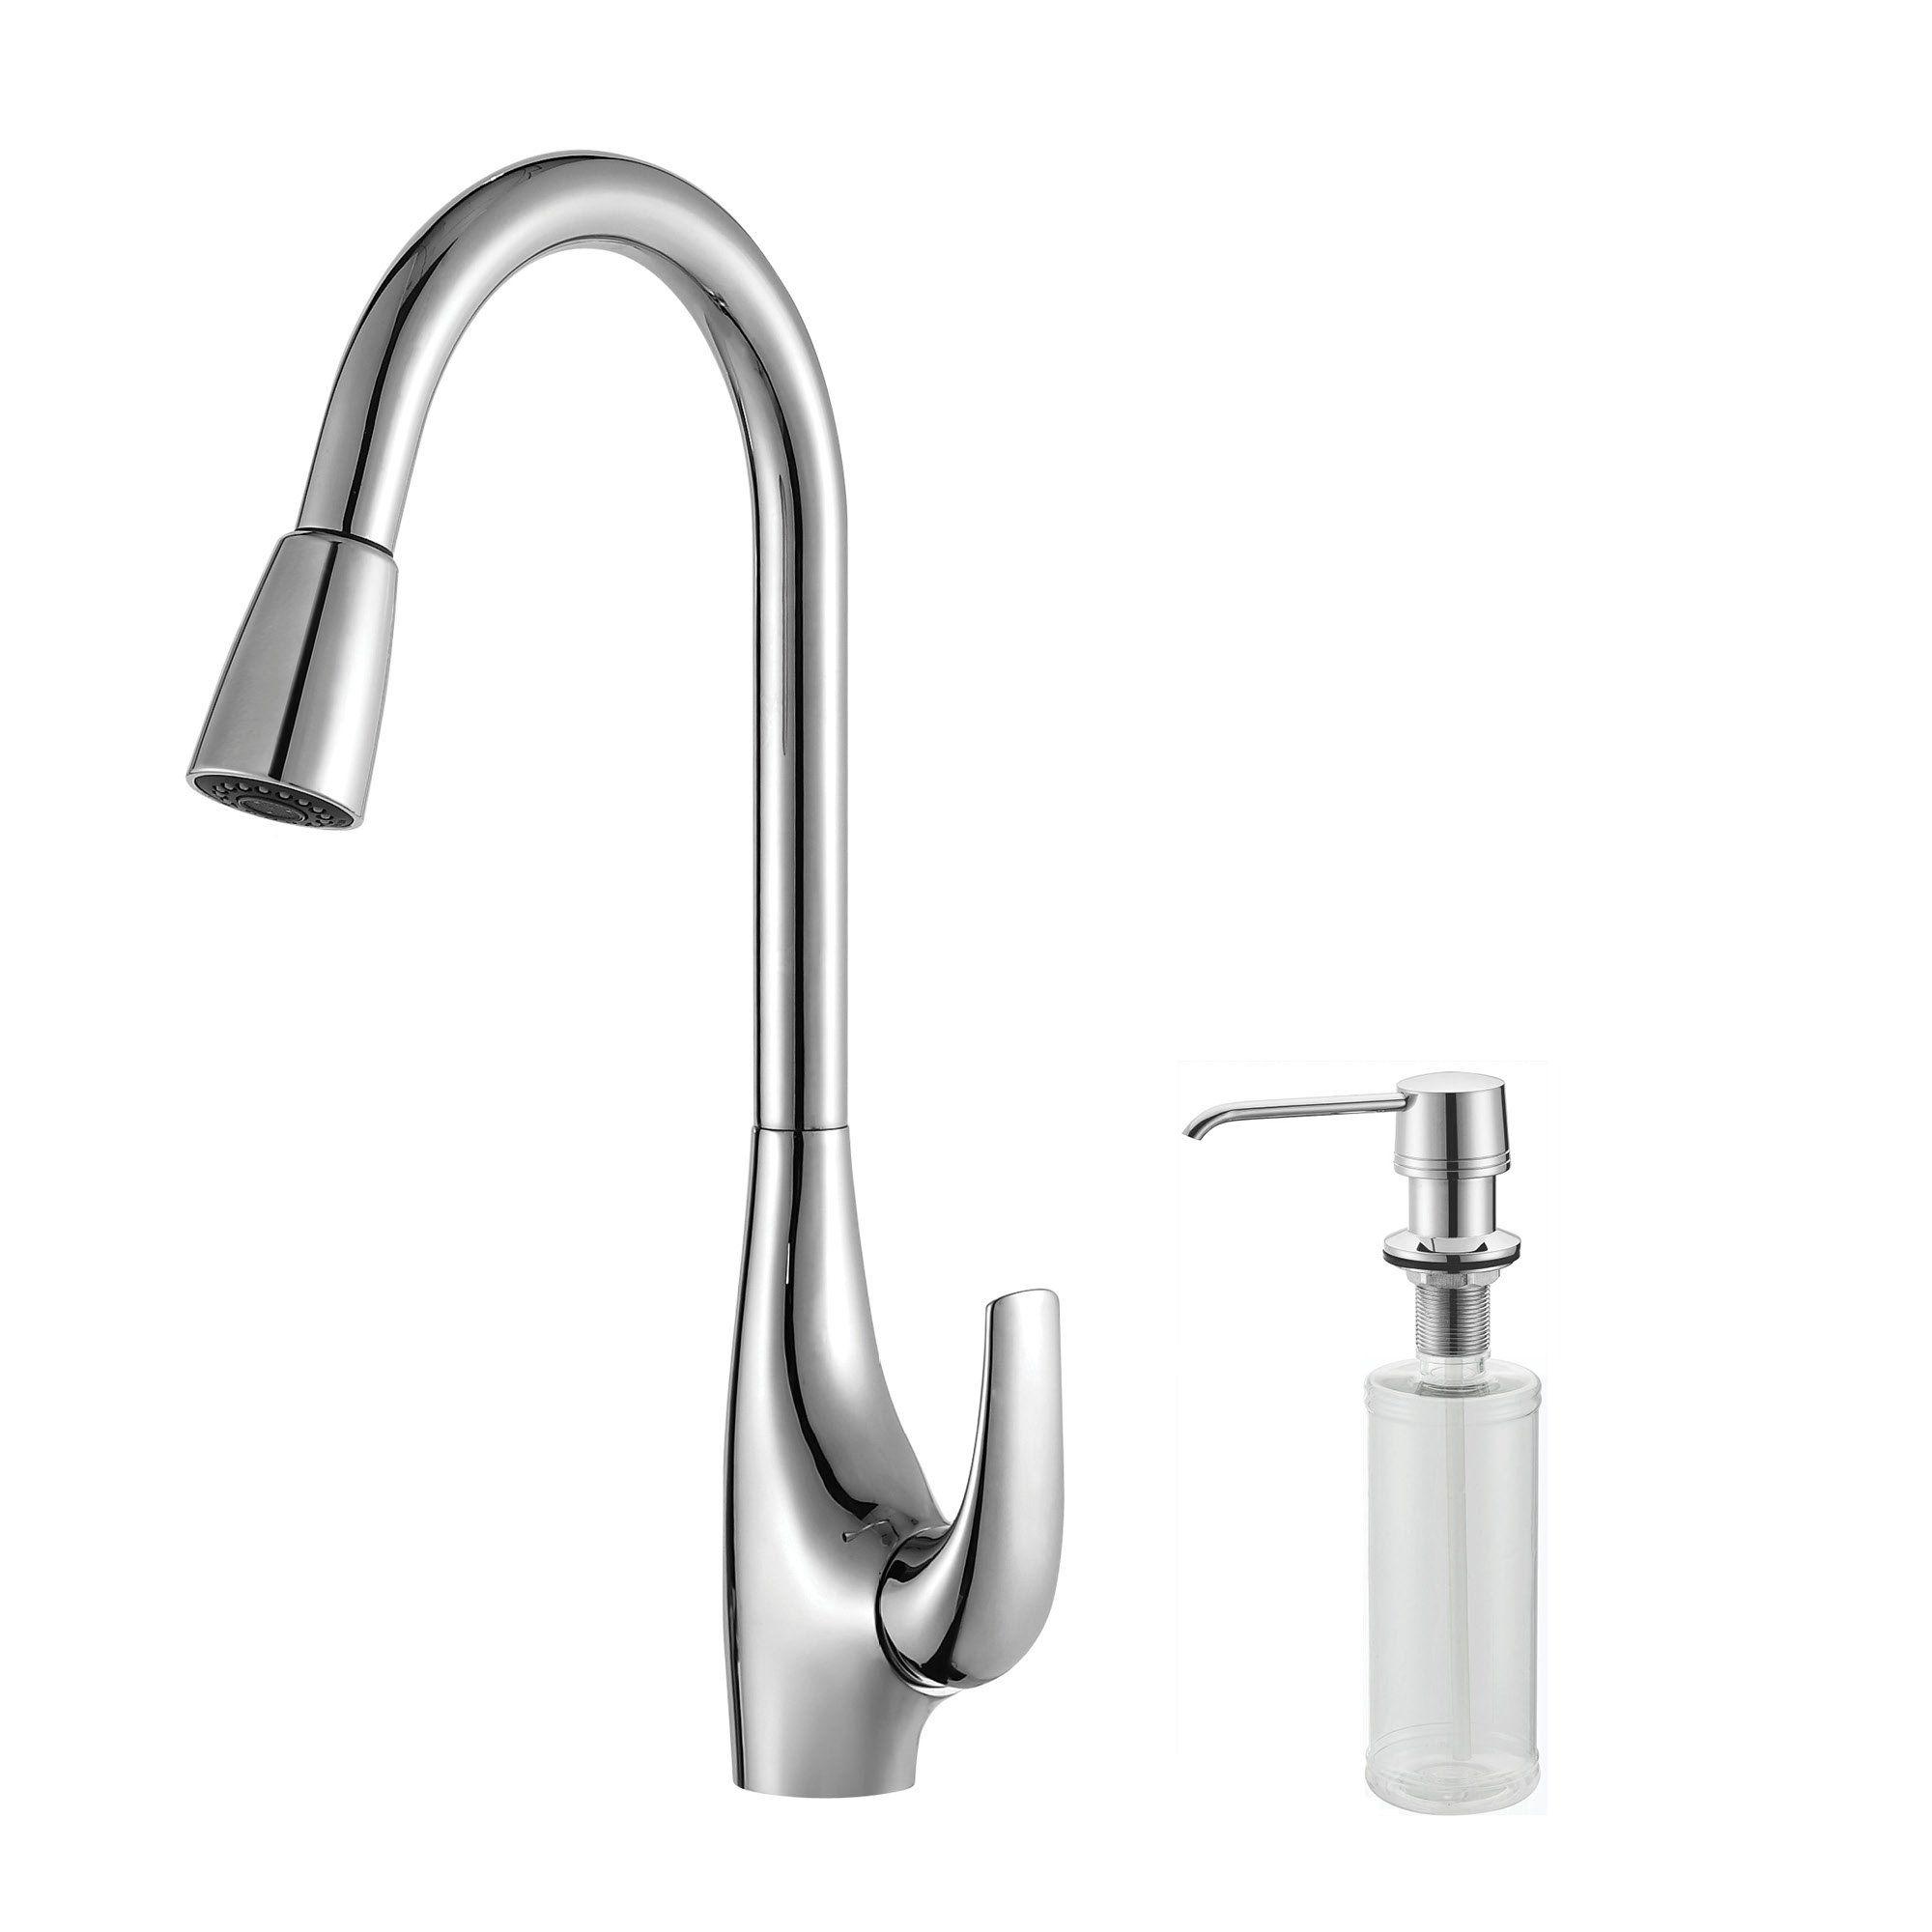 Kraus Kpf 1621 Ksd 30ch Single Lever Pull Down Kitchen Faucet And Soap Dispenser Chrome Chrome Kitchen Faucet Kitchen Faucet Stainless Steel Kitchen